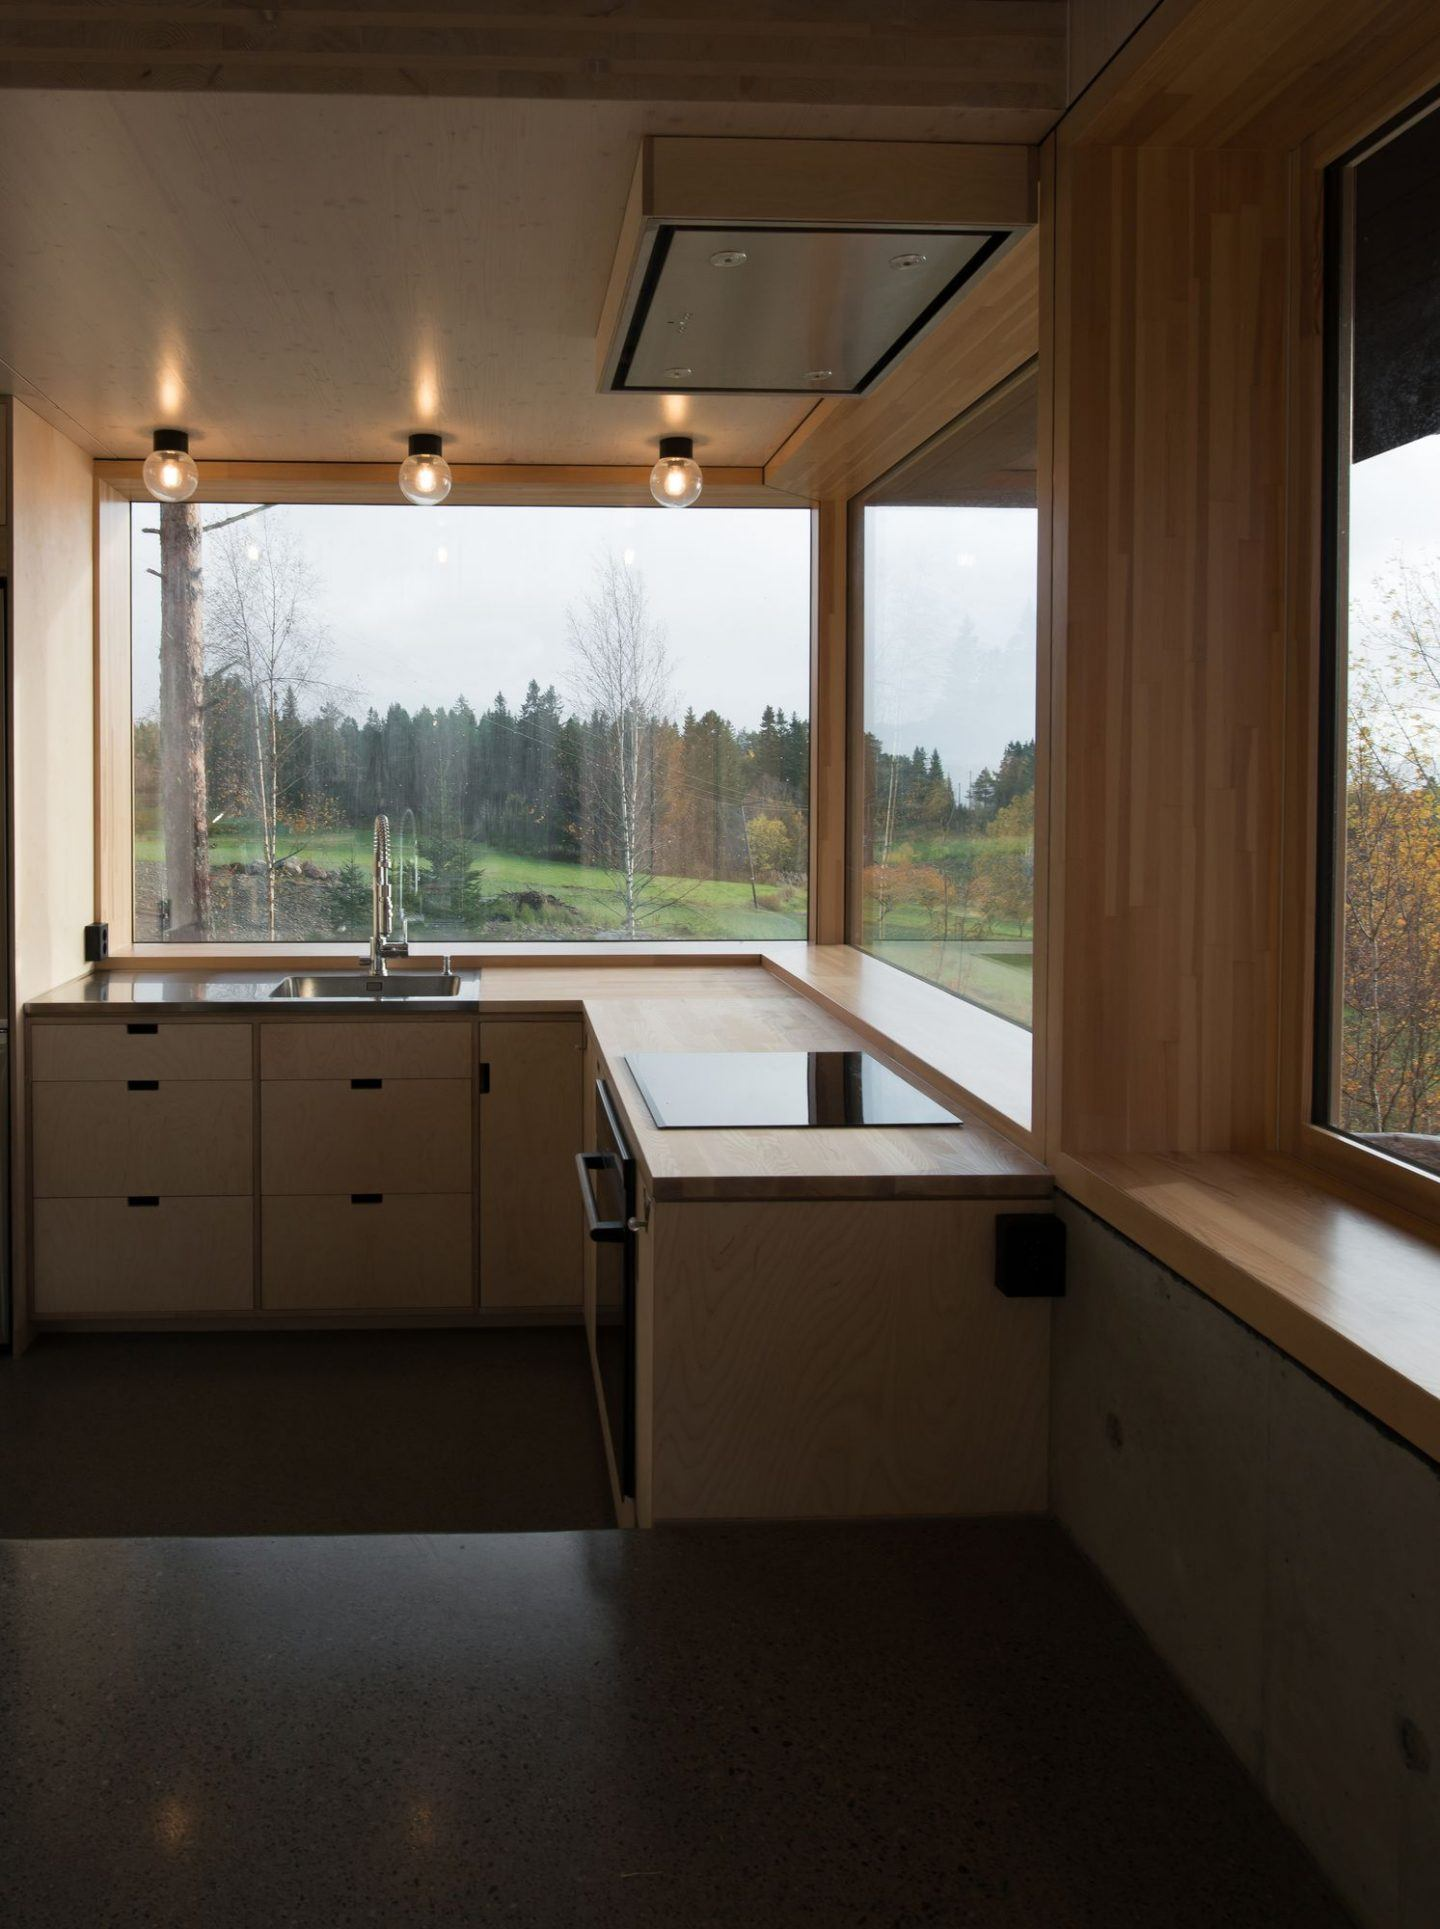 IGNANT-Architecture-Sanden-Hodnekvam-Cabin-Rones-11